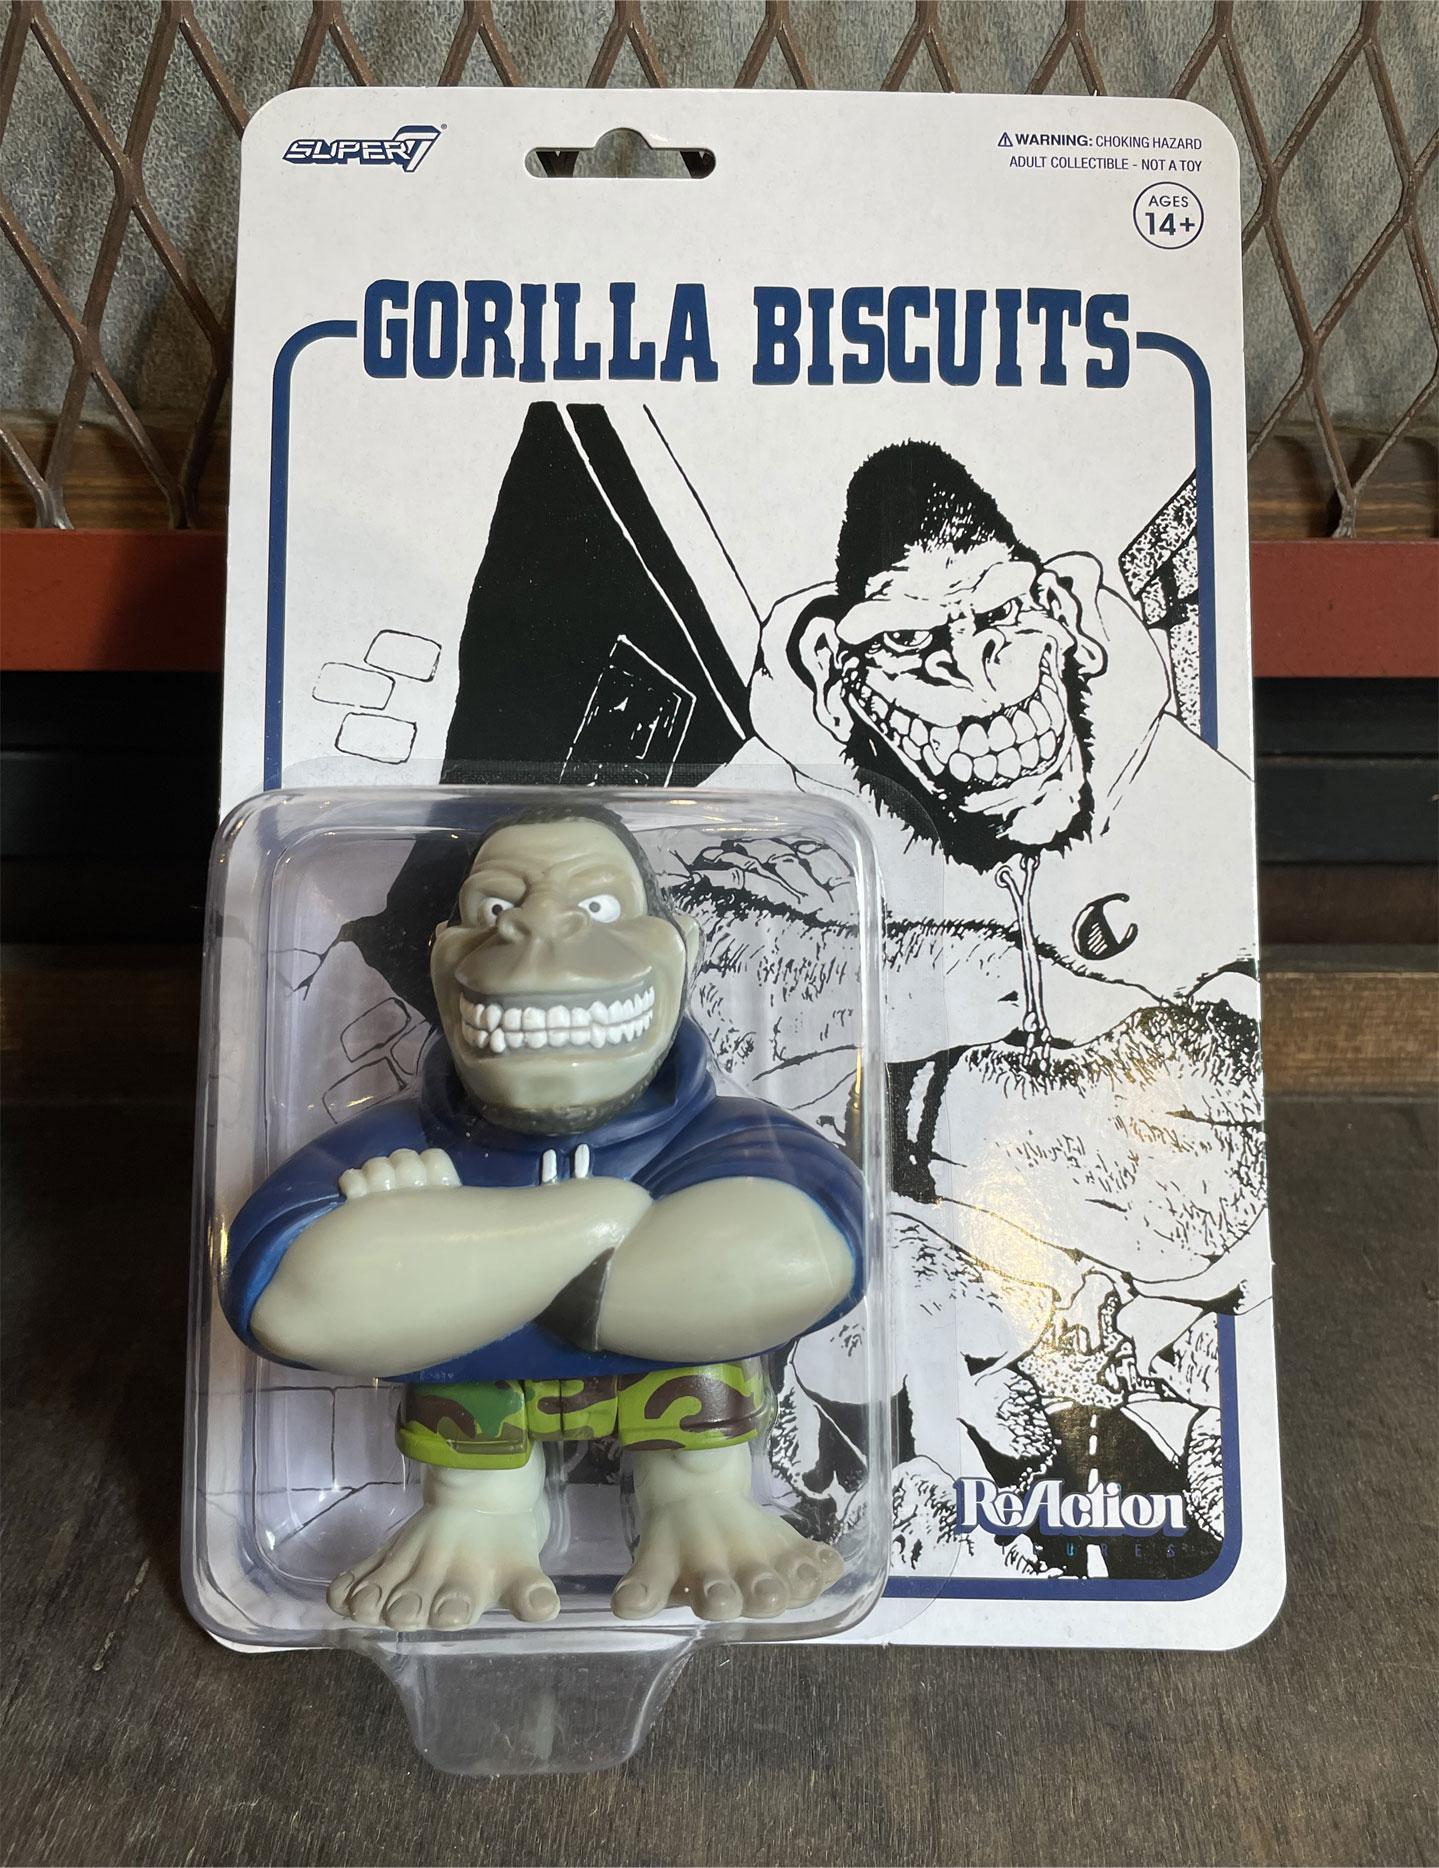 GORILLA BISCUITS x SUPER 7 リアクションフィギュア